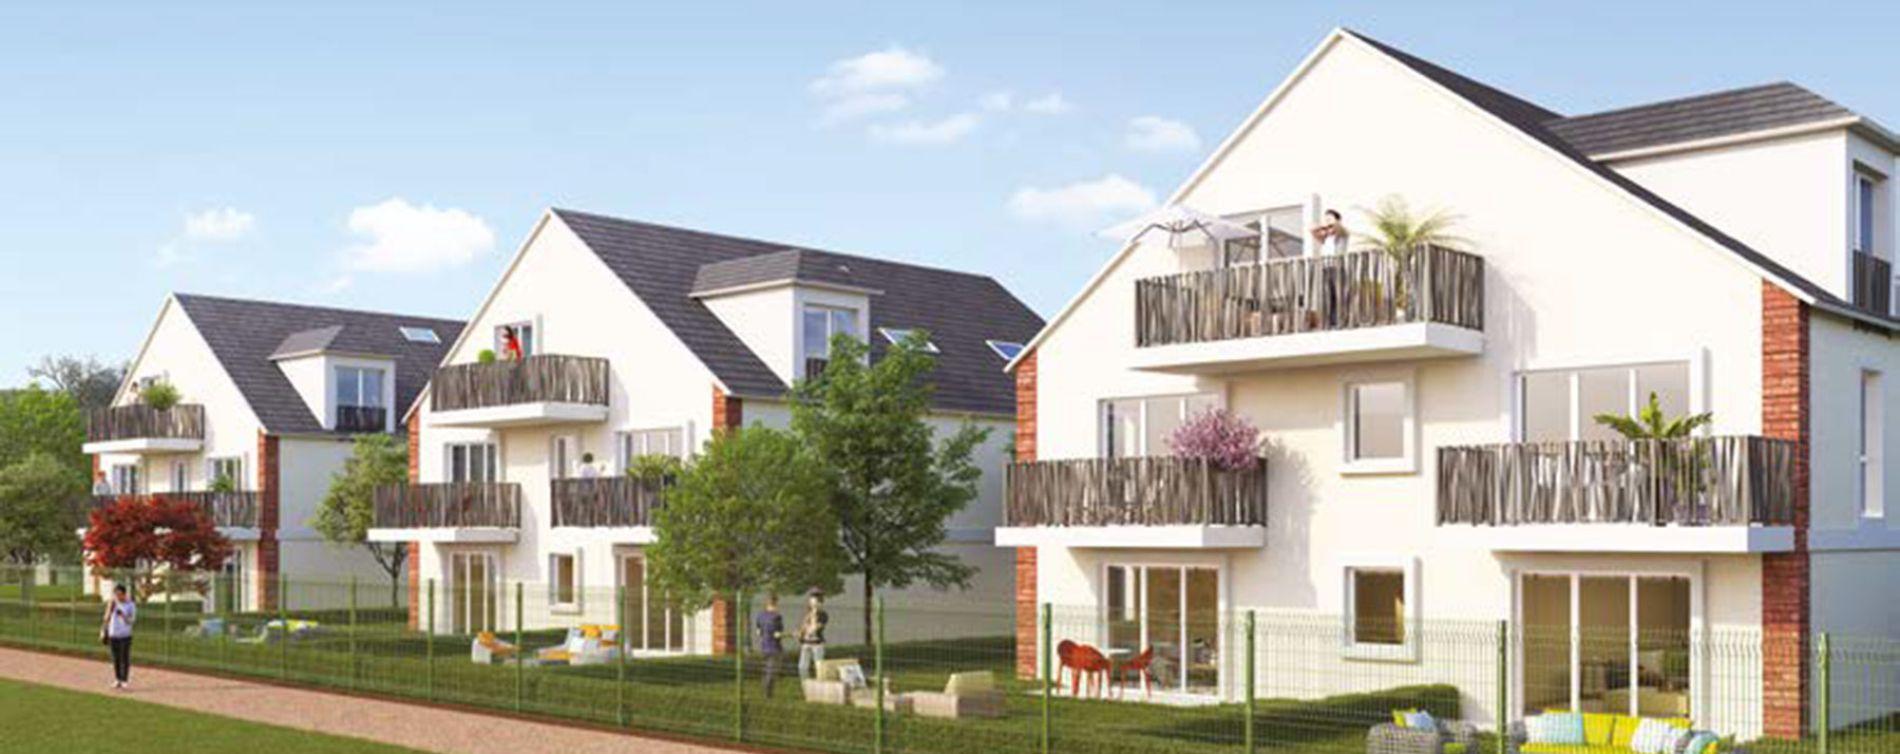 Chevry-Cossigny : programme immobilier neuve « Le Domaine des Arts » (2)